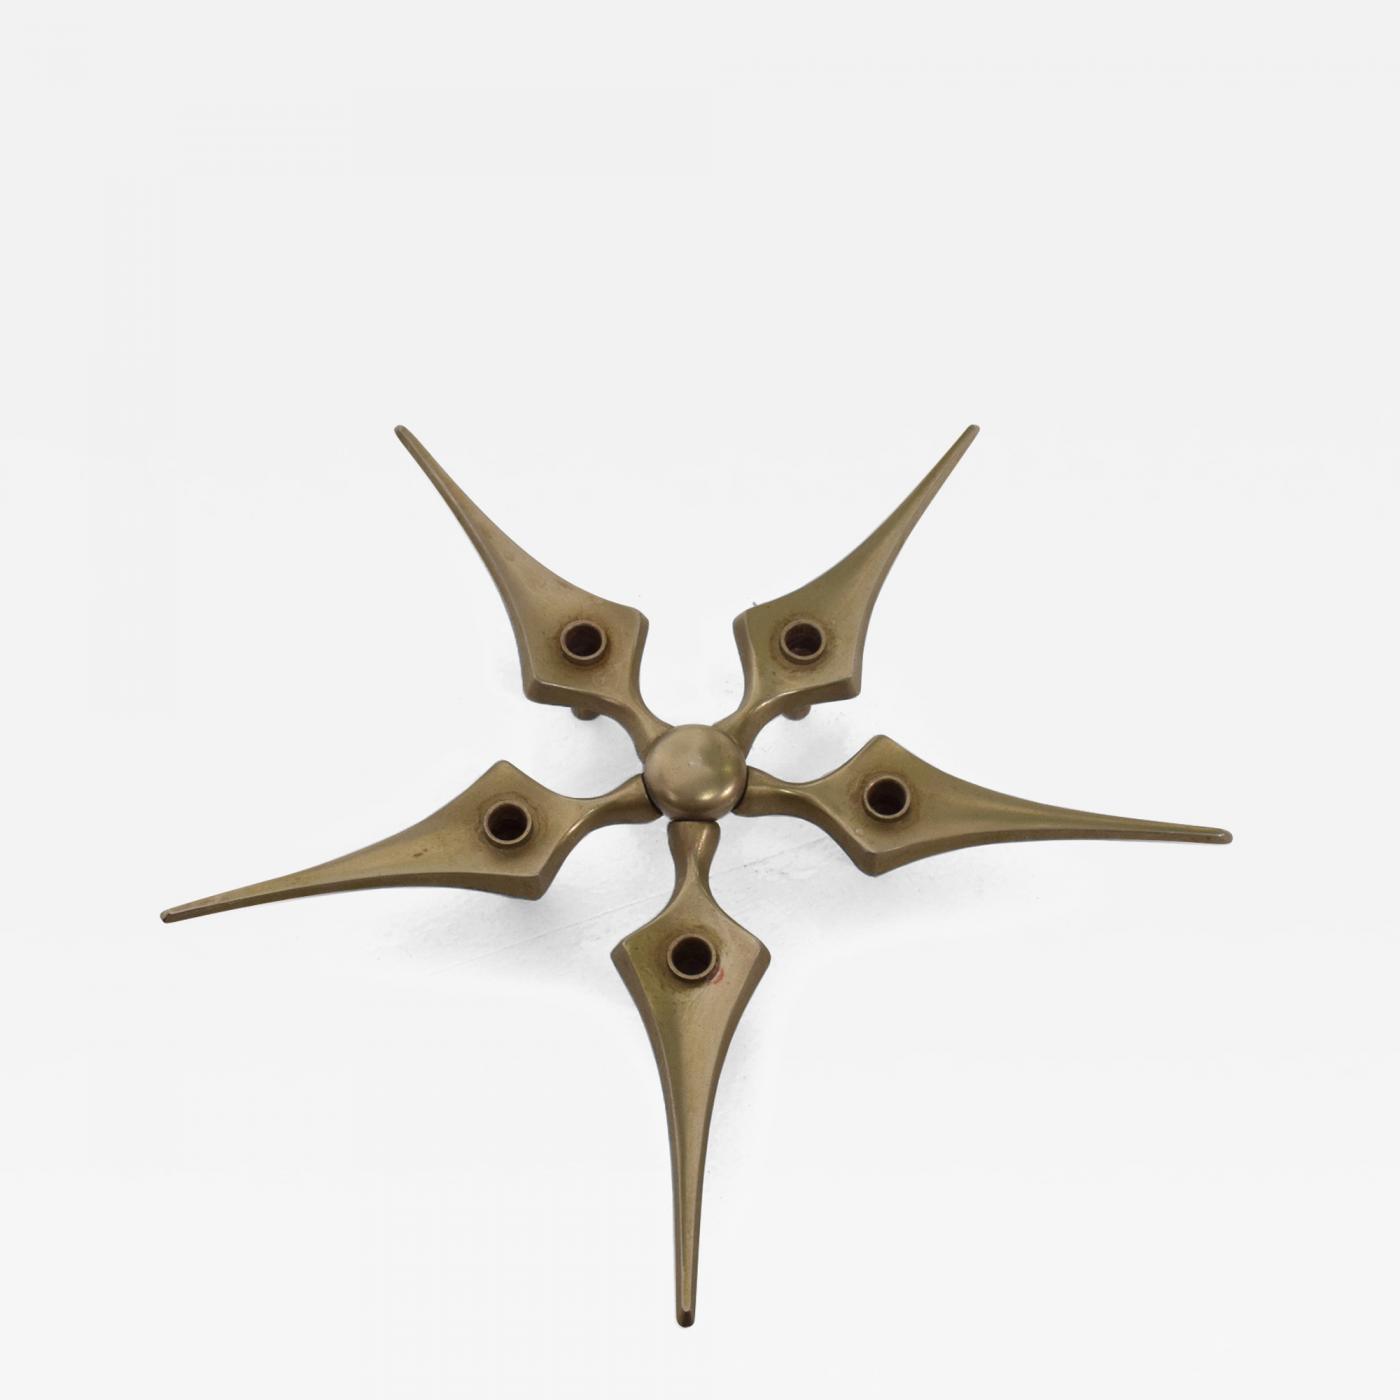 Gemütlich Nagel Star Bilder - Nagellack-Design-Ideen - glennbasso.com